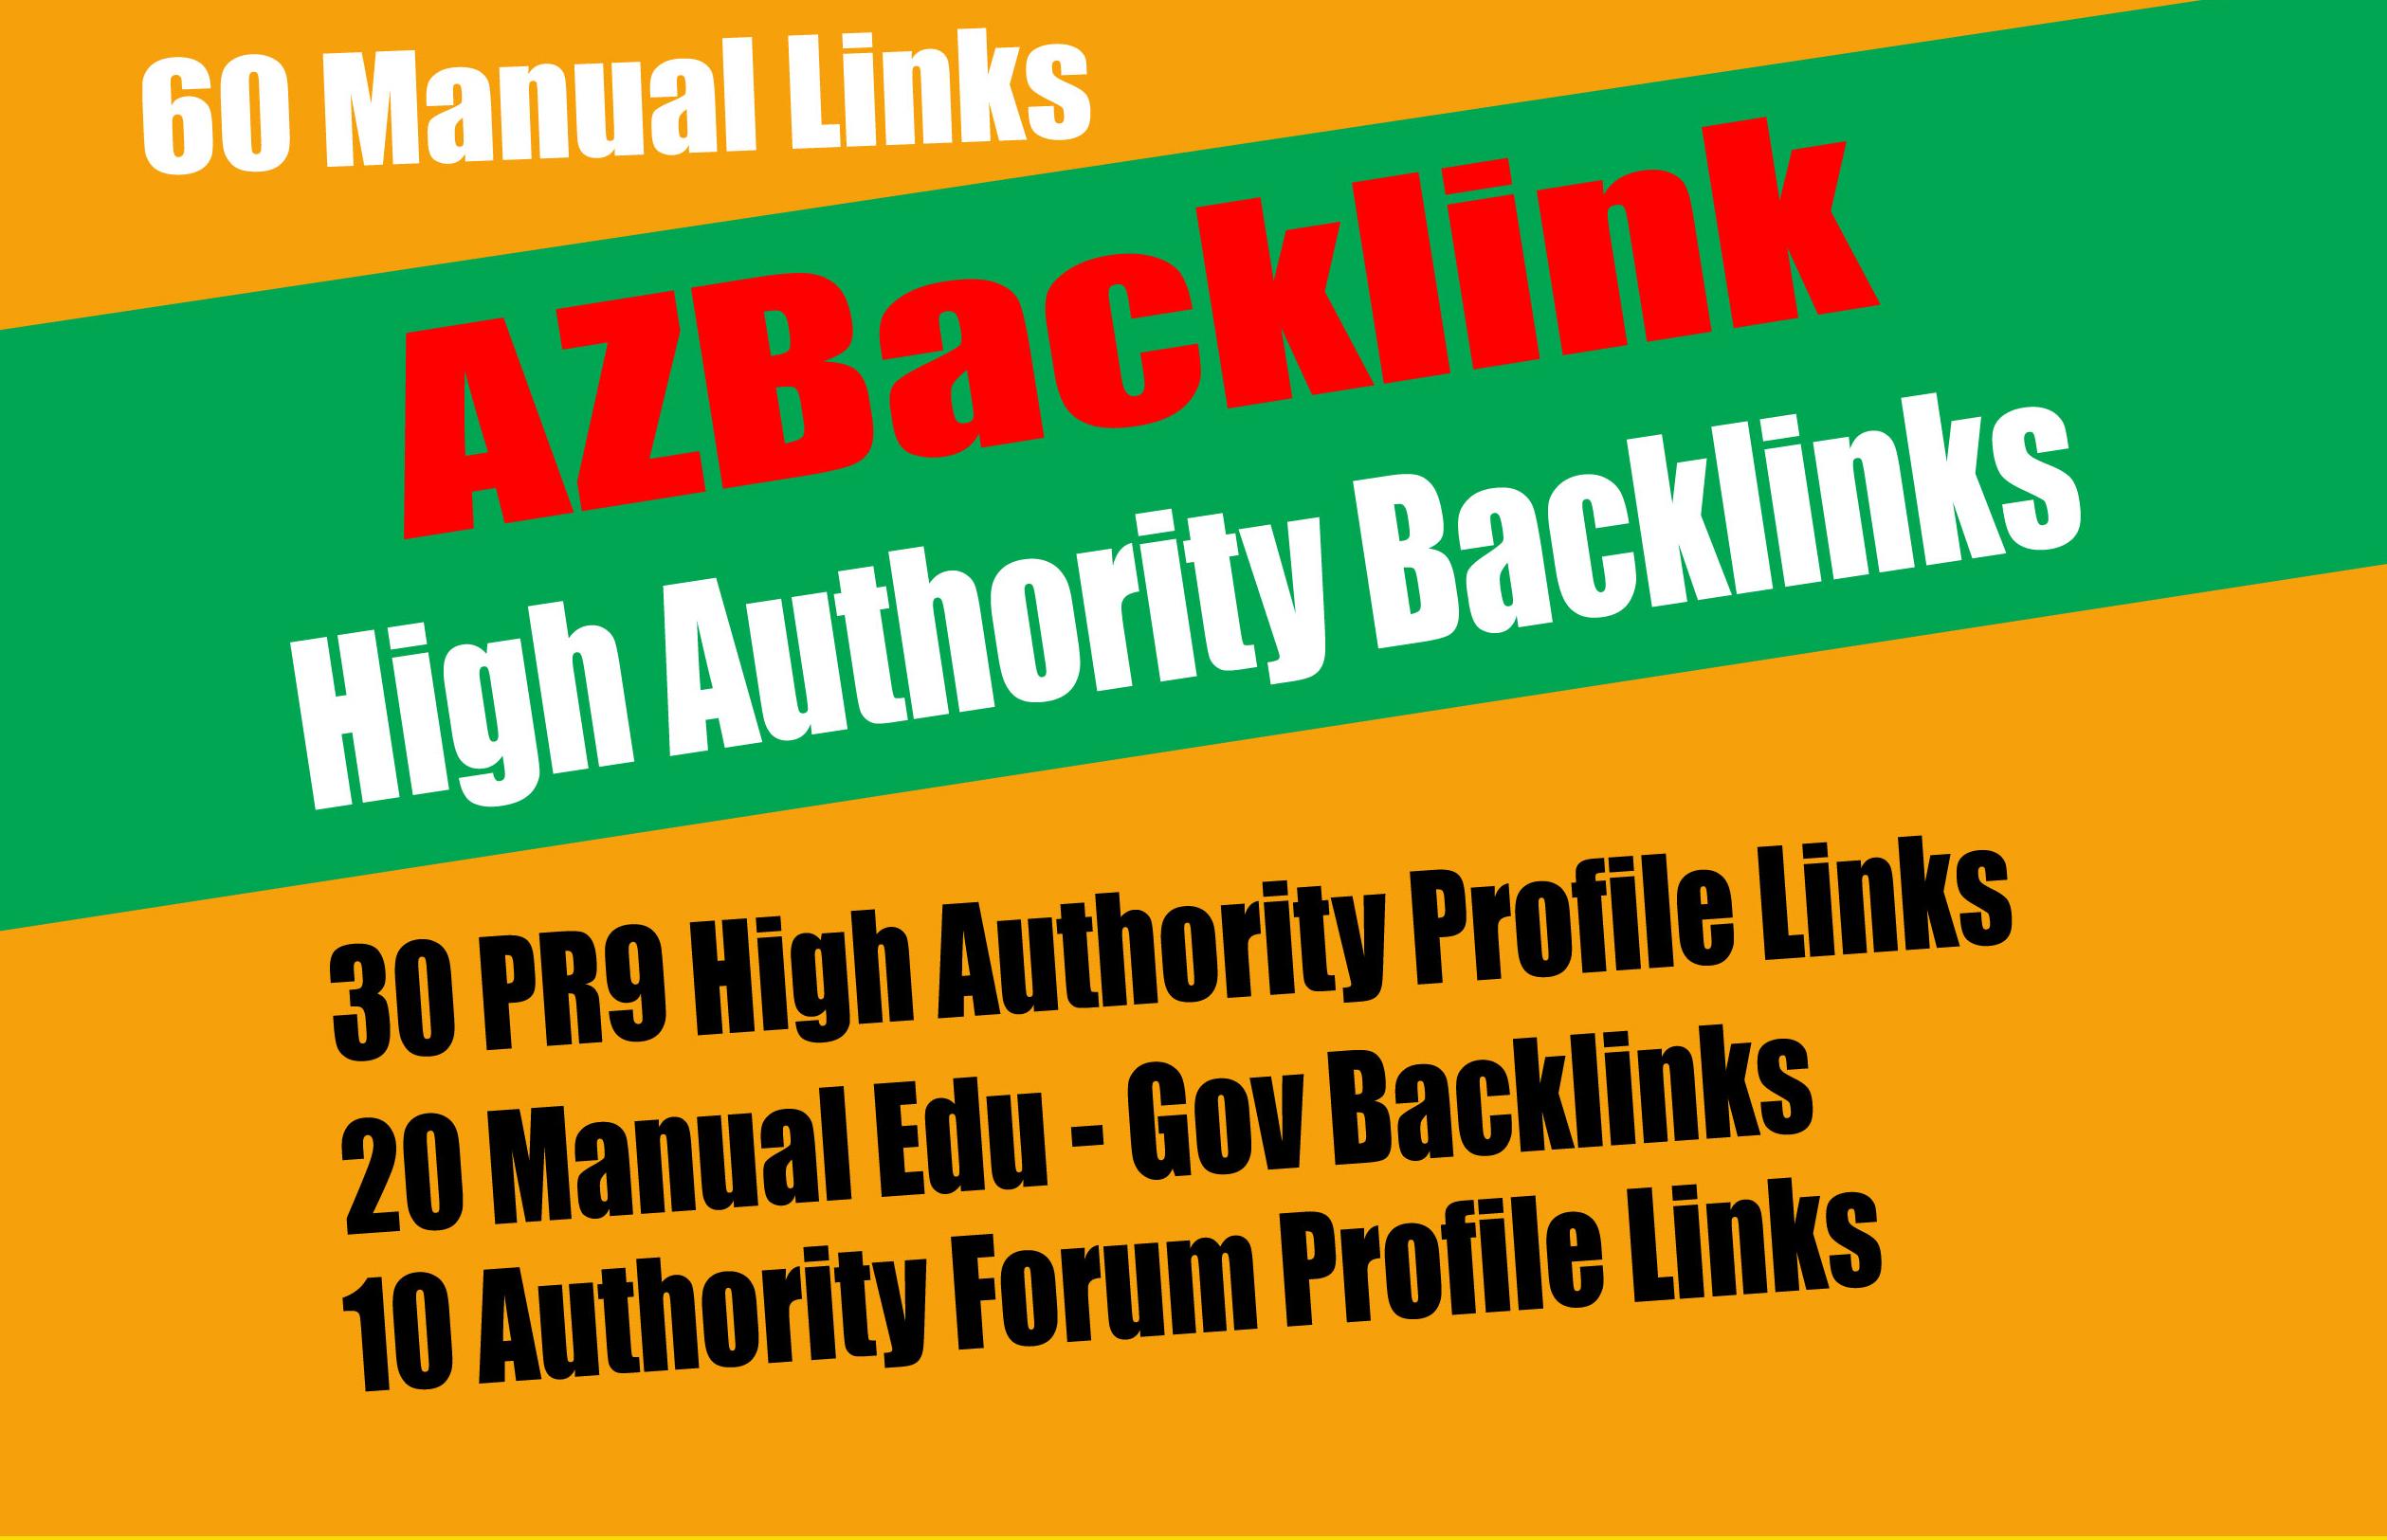 60 Authority Backlinks From 30 HQ Profile + 20 Edu-Gov Profile + 10 Forum Profile Links